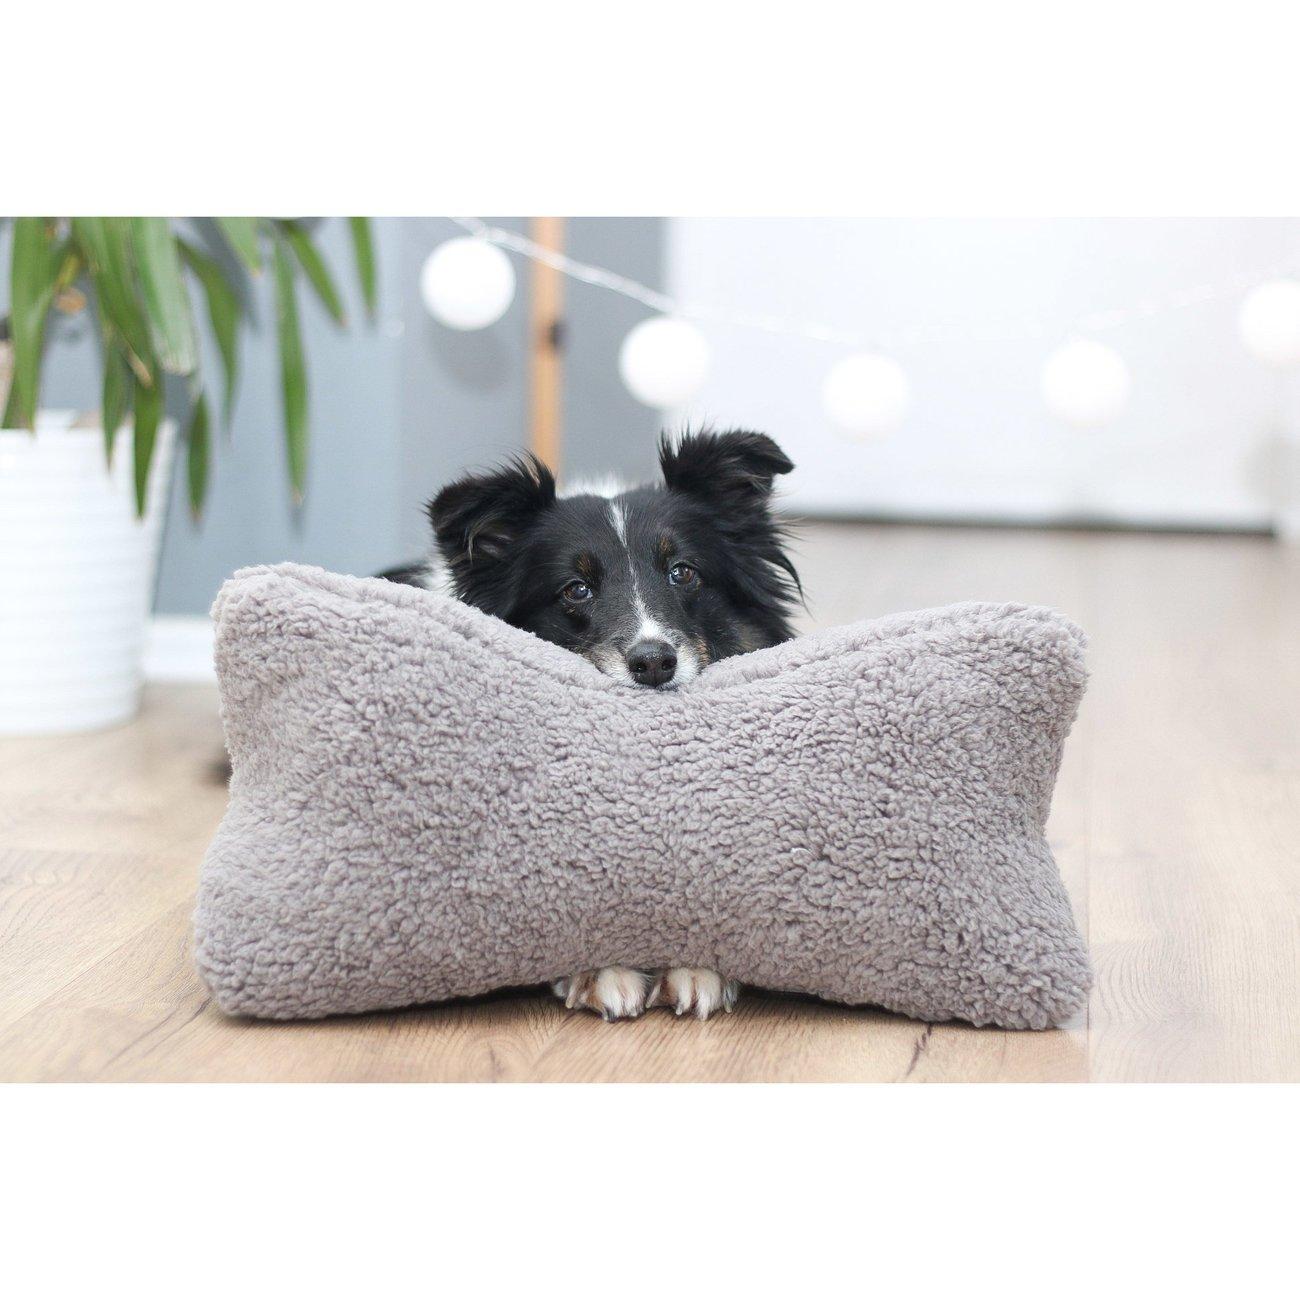 TRIXIE Hunde Kopfkissen Bendson 38000, Bild 3